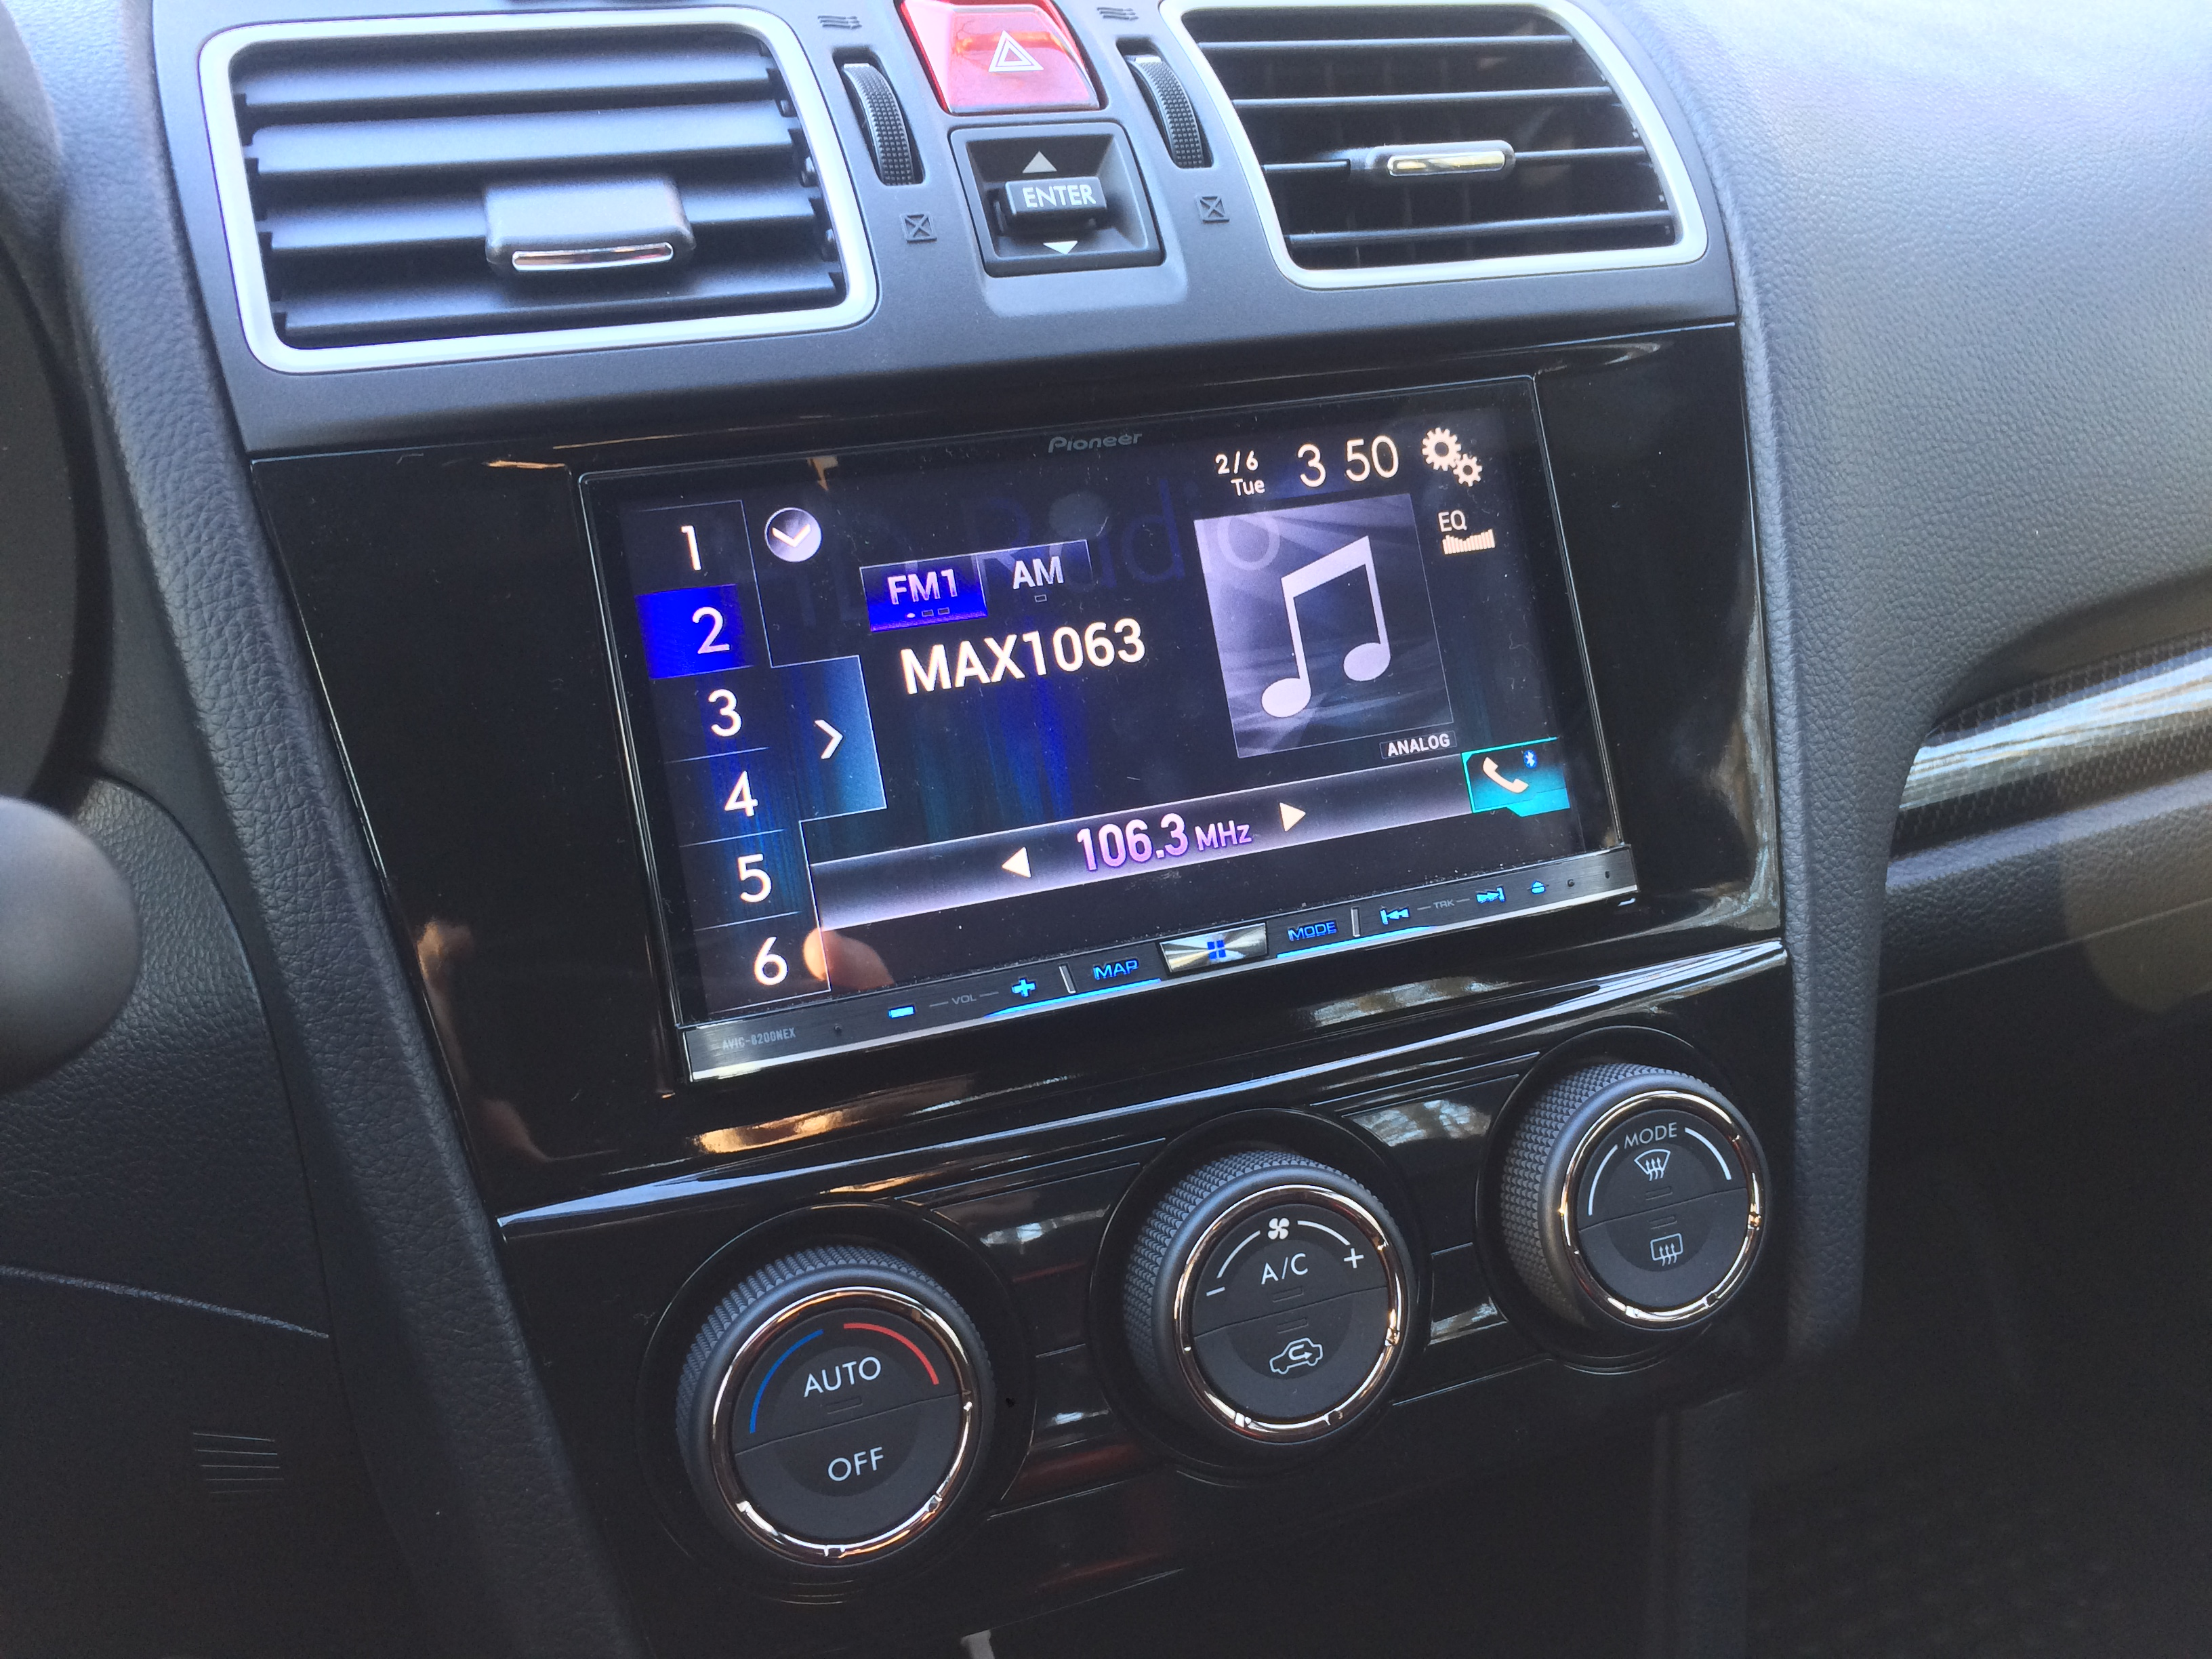 Blossom Installations 187 Subaru Wrx Gets Nex Navigation And